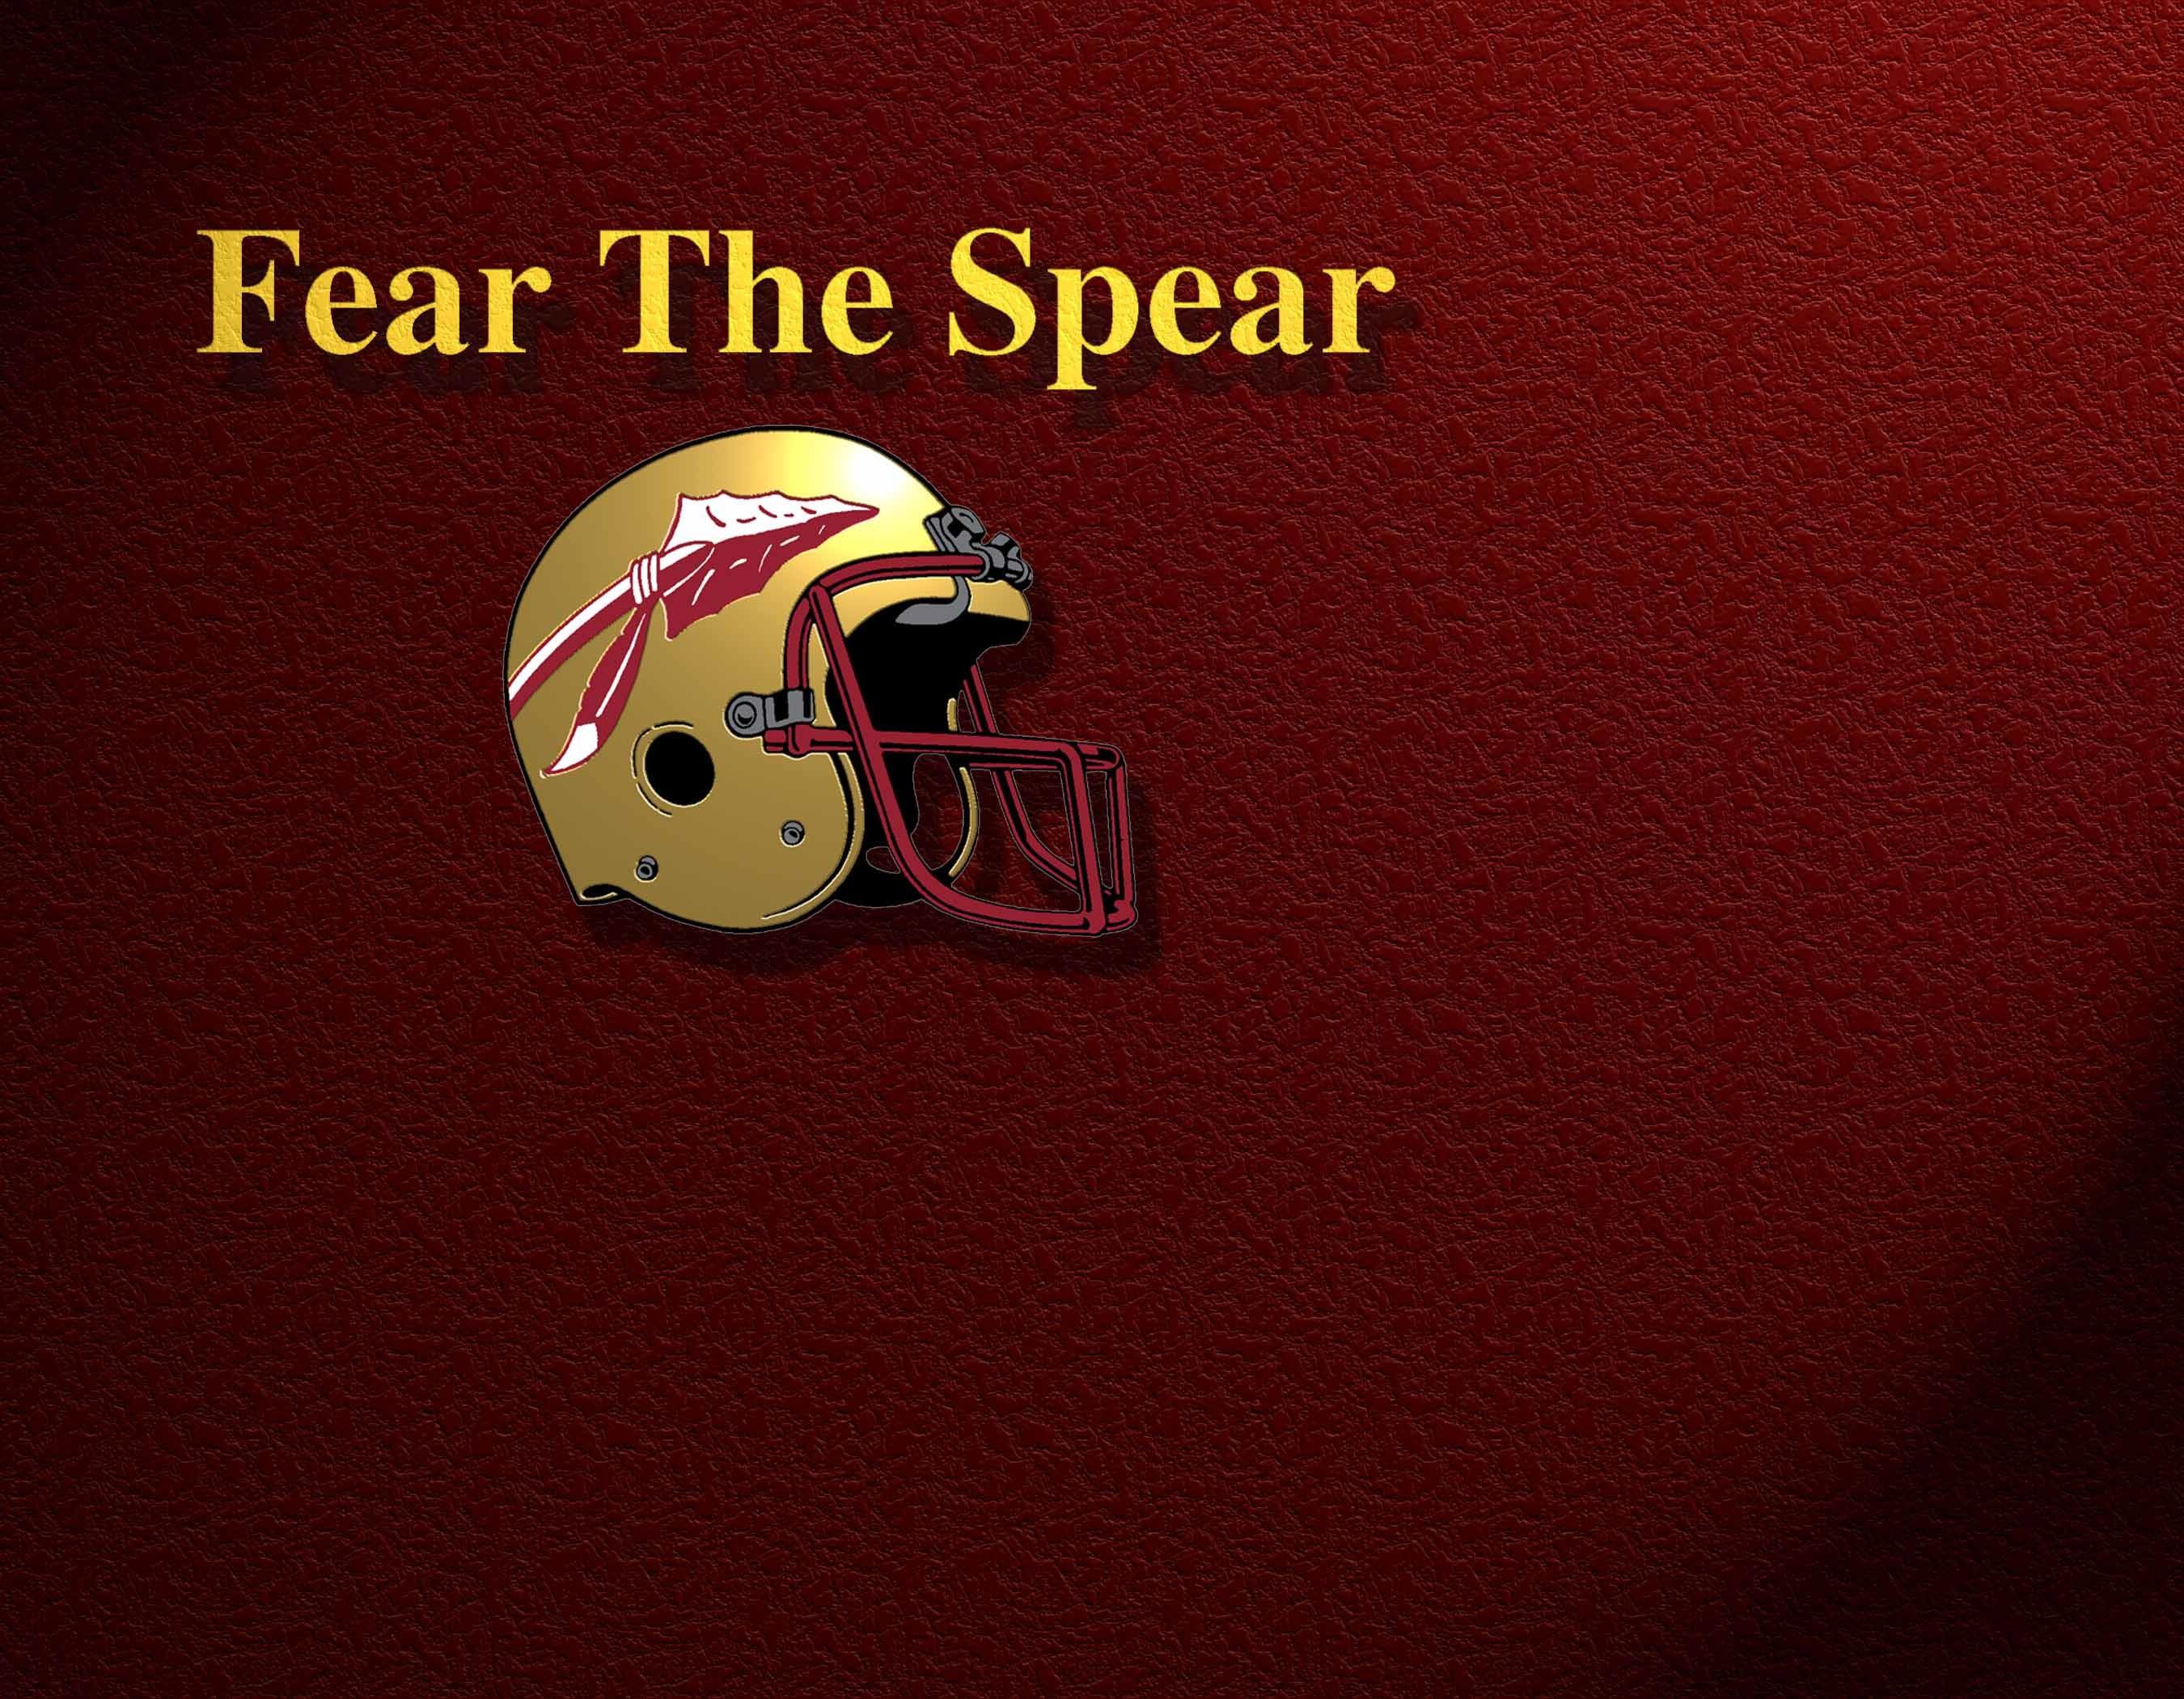 FORIDA STATE SEMINOLES college football (7)_JPG wallpaper      210928   WallpaperUP